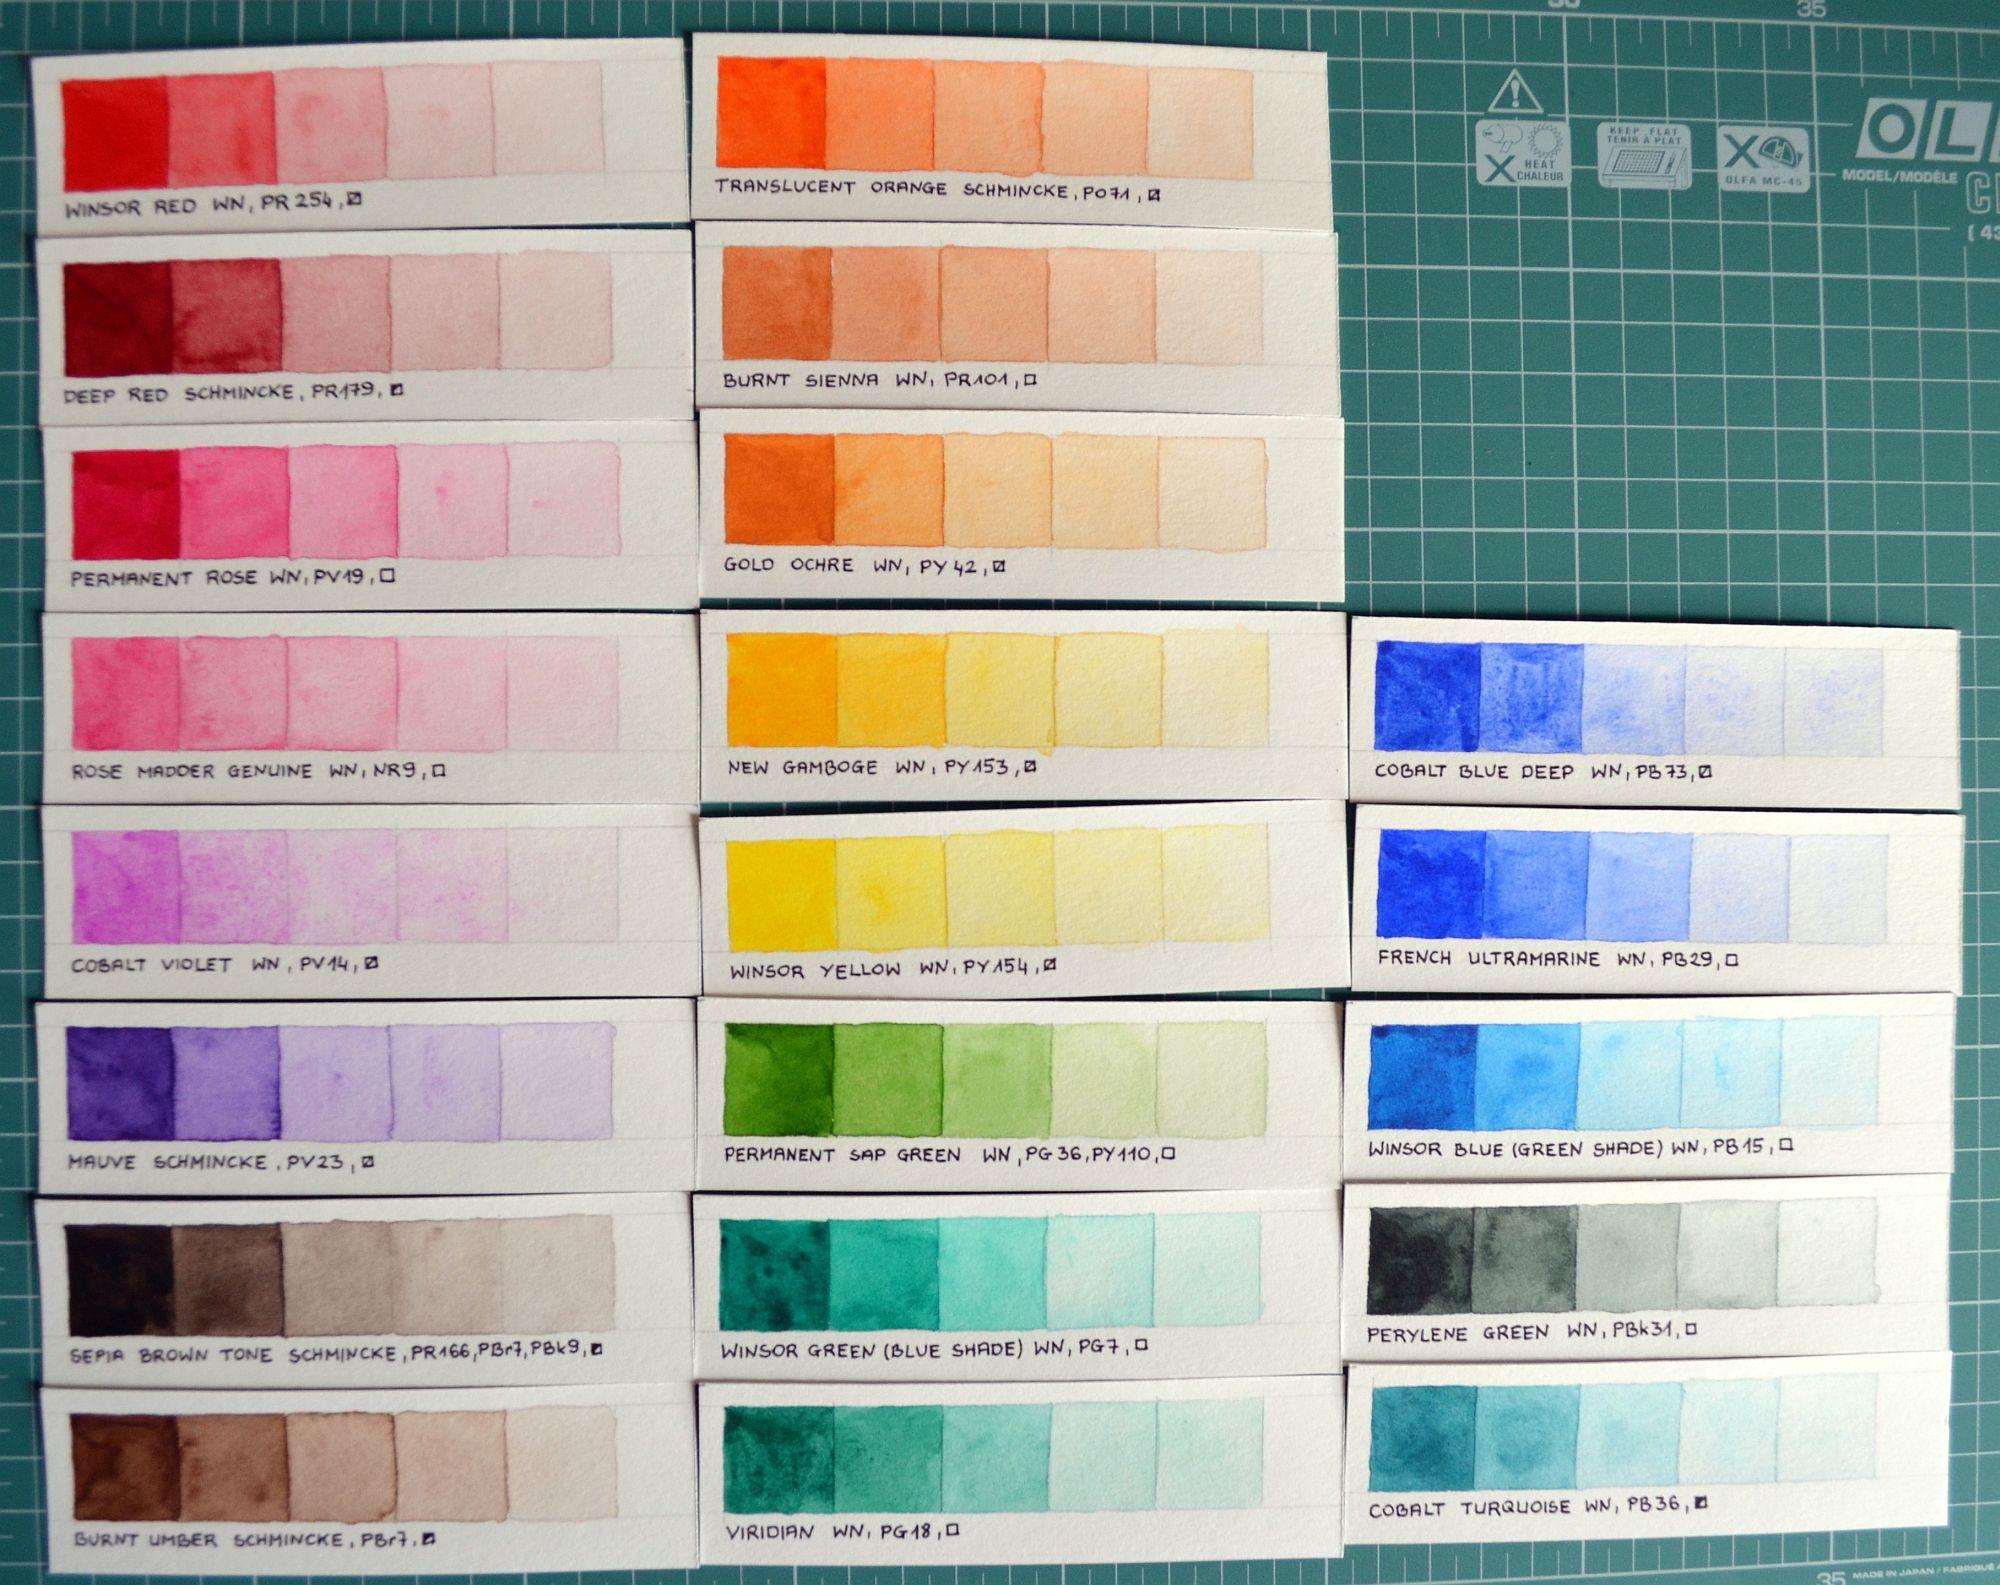 Schmincke Horadam Aquarellfarben Auf Papier Aquarellfarben